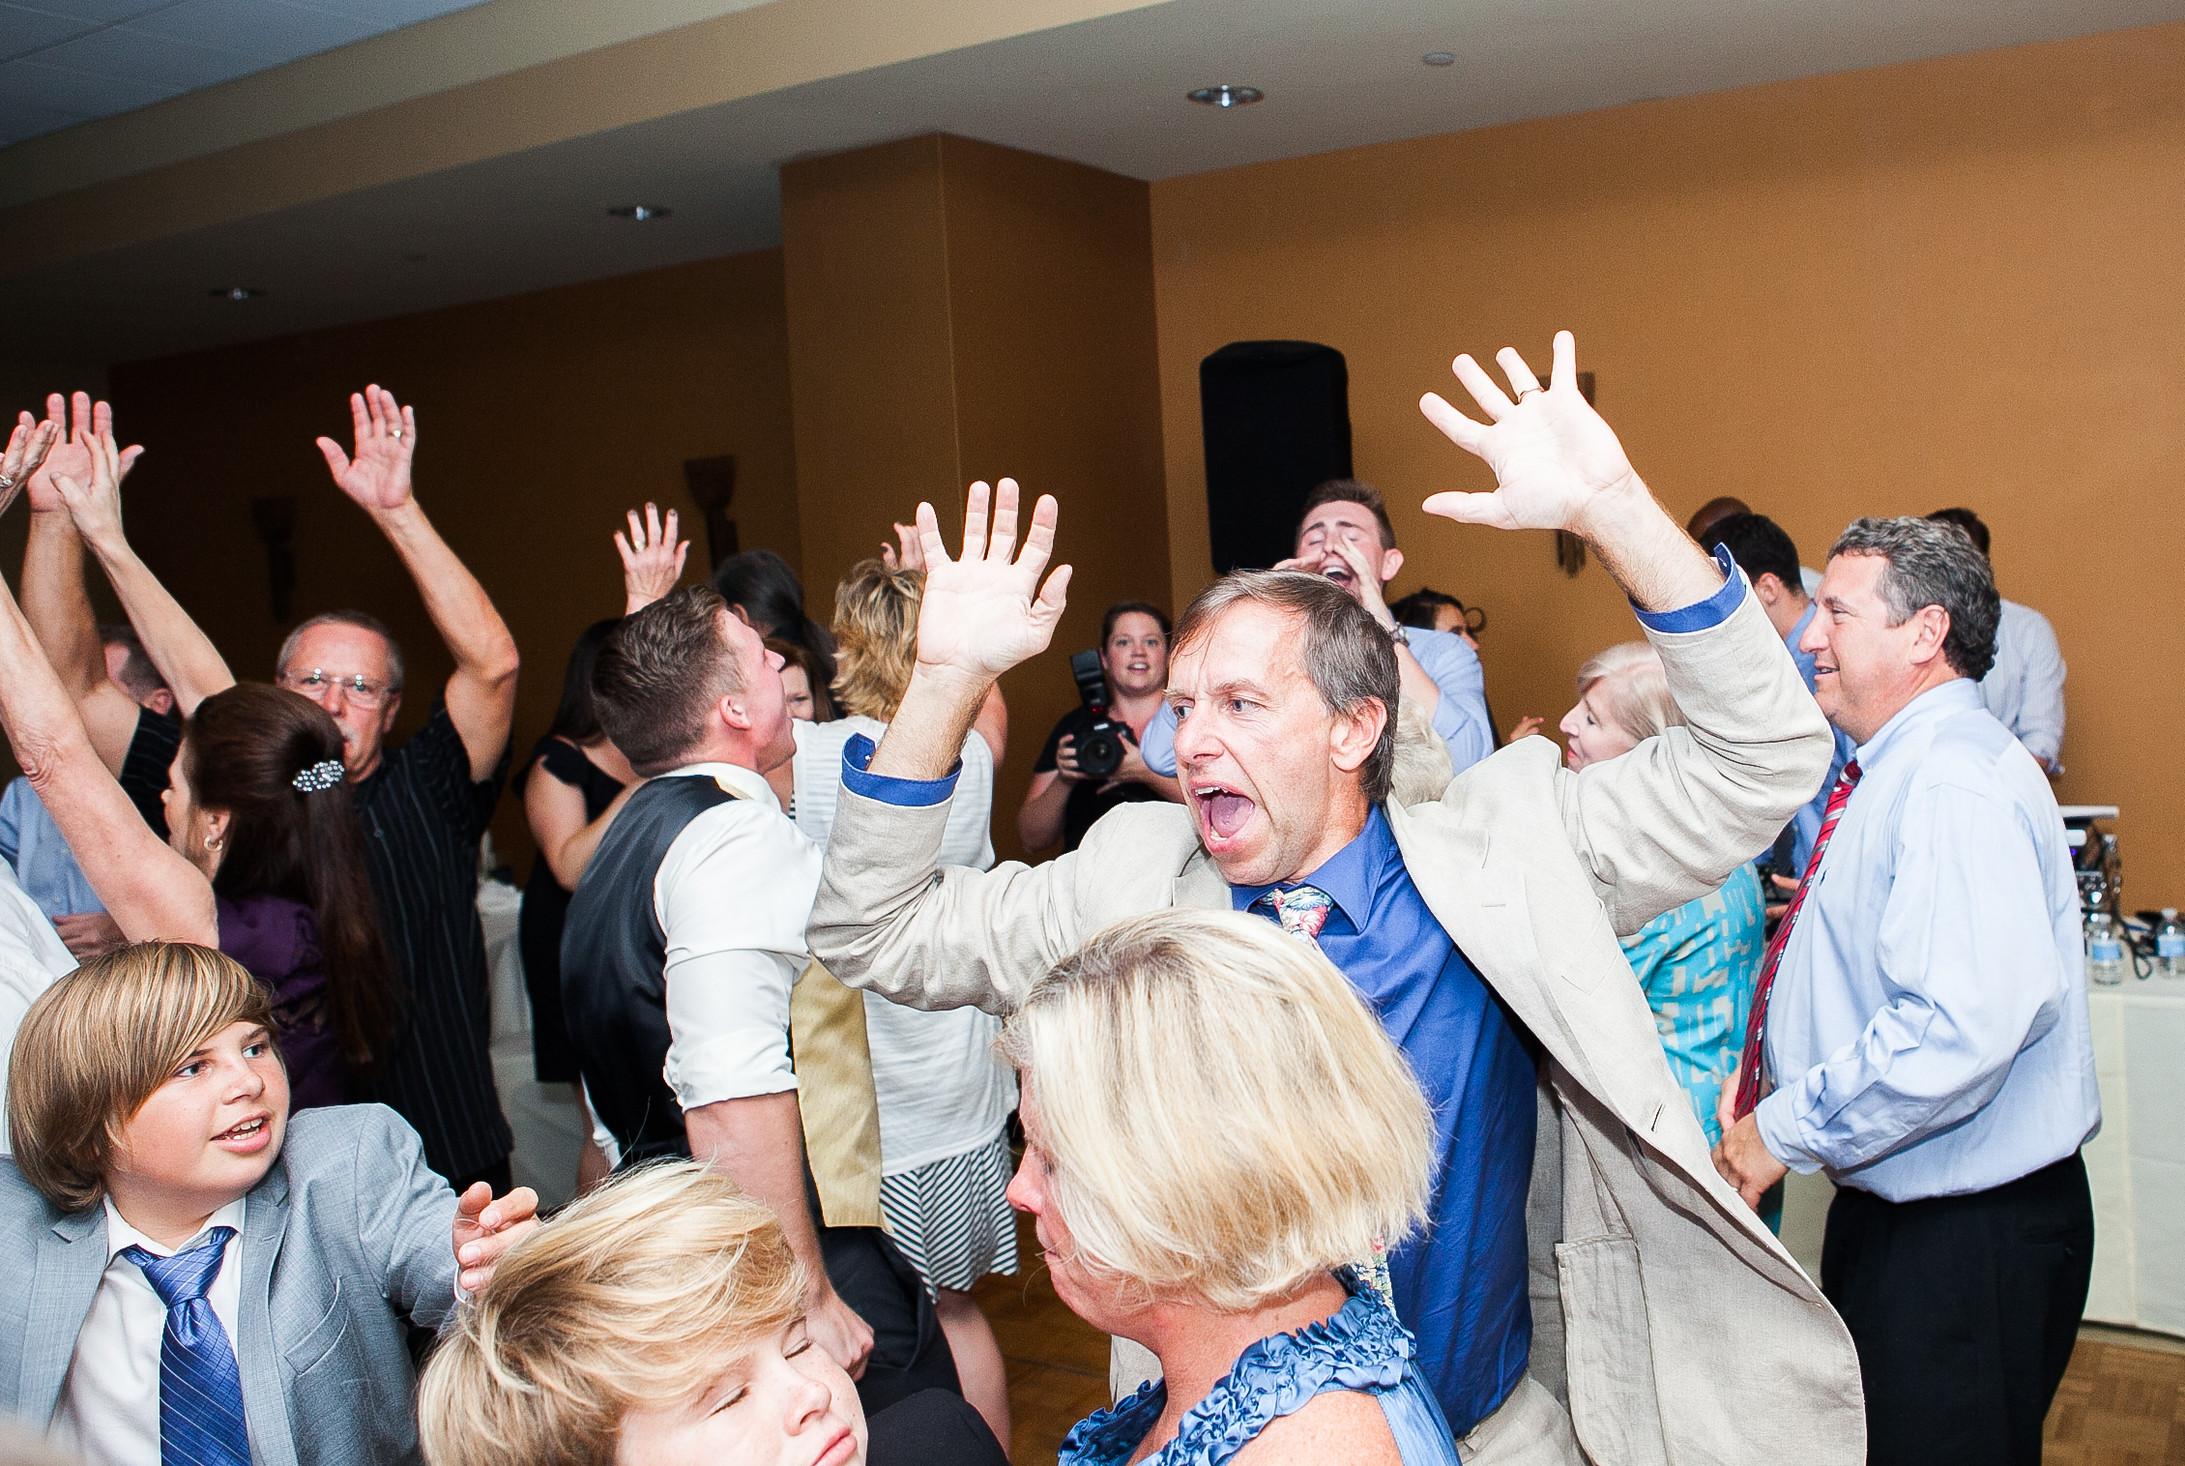 Manhattan Beach Dance Party Wedding - DJ Jack Farmer